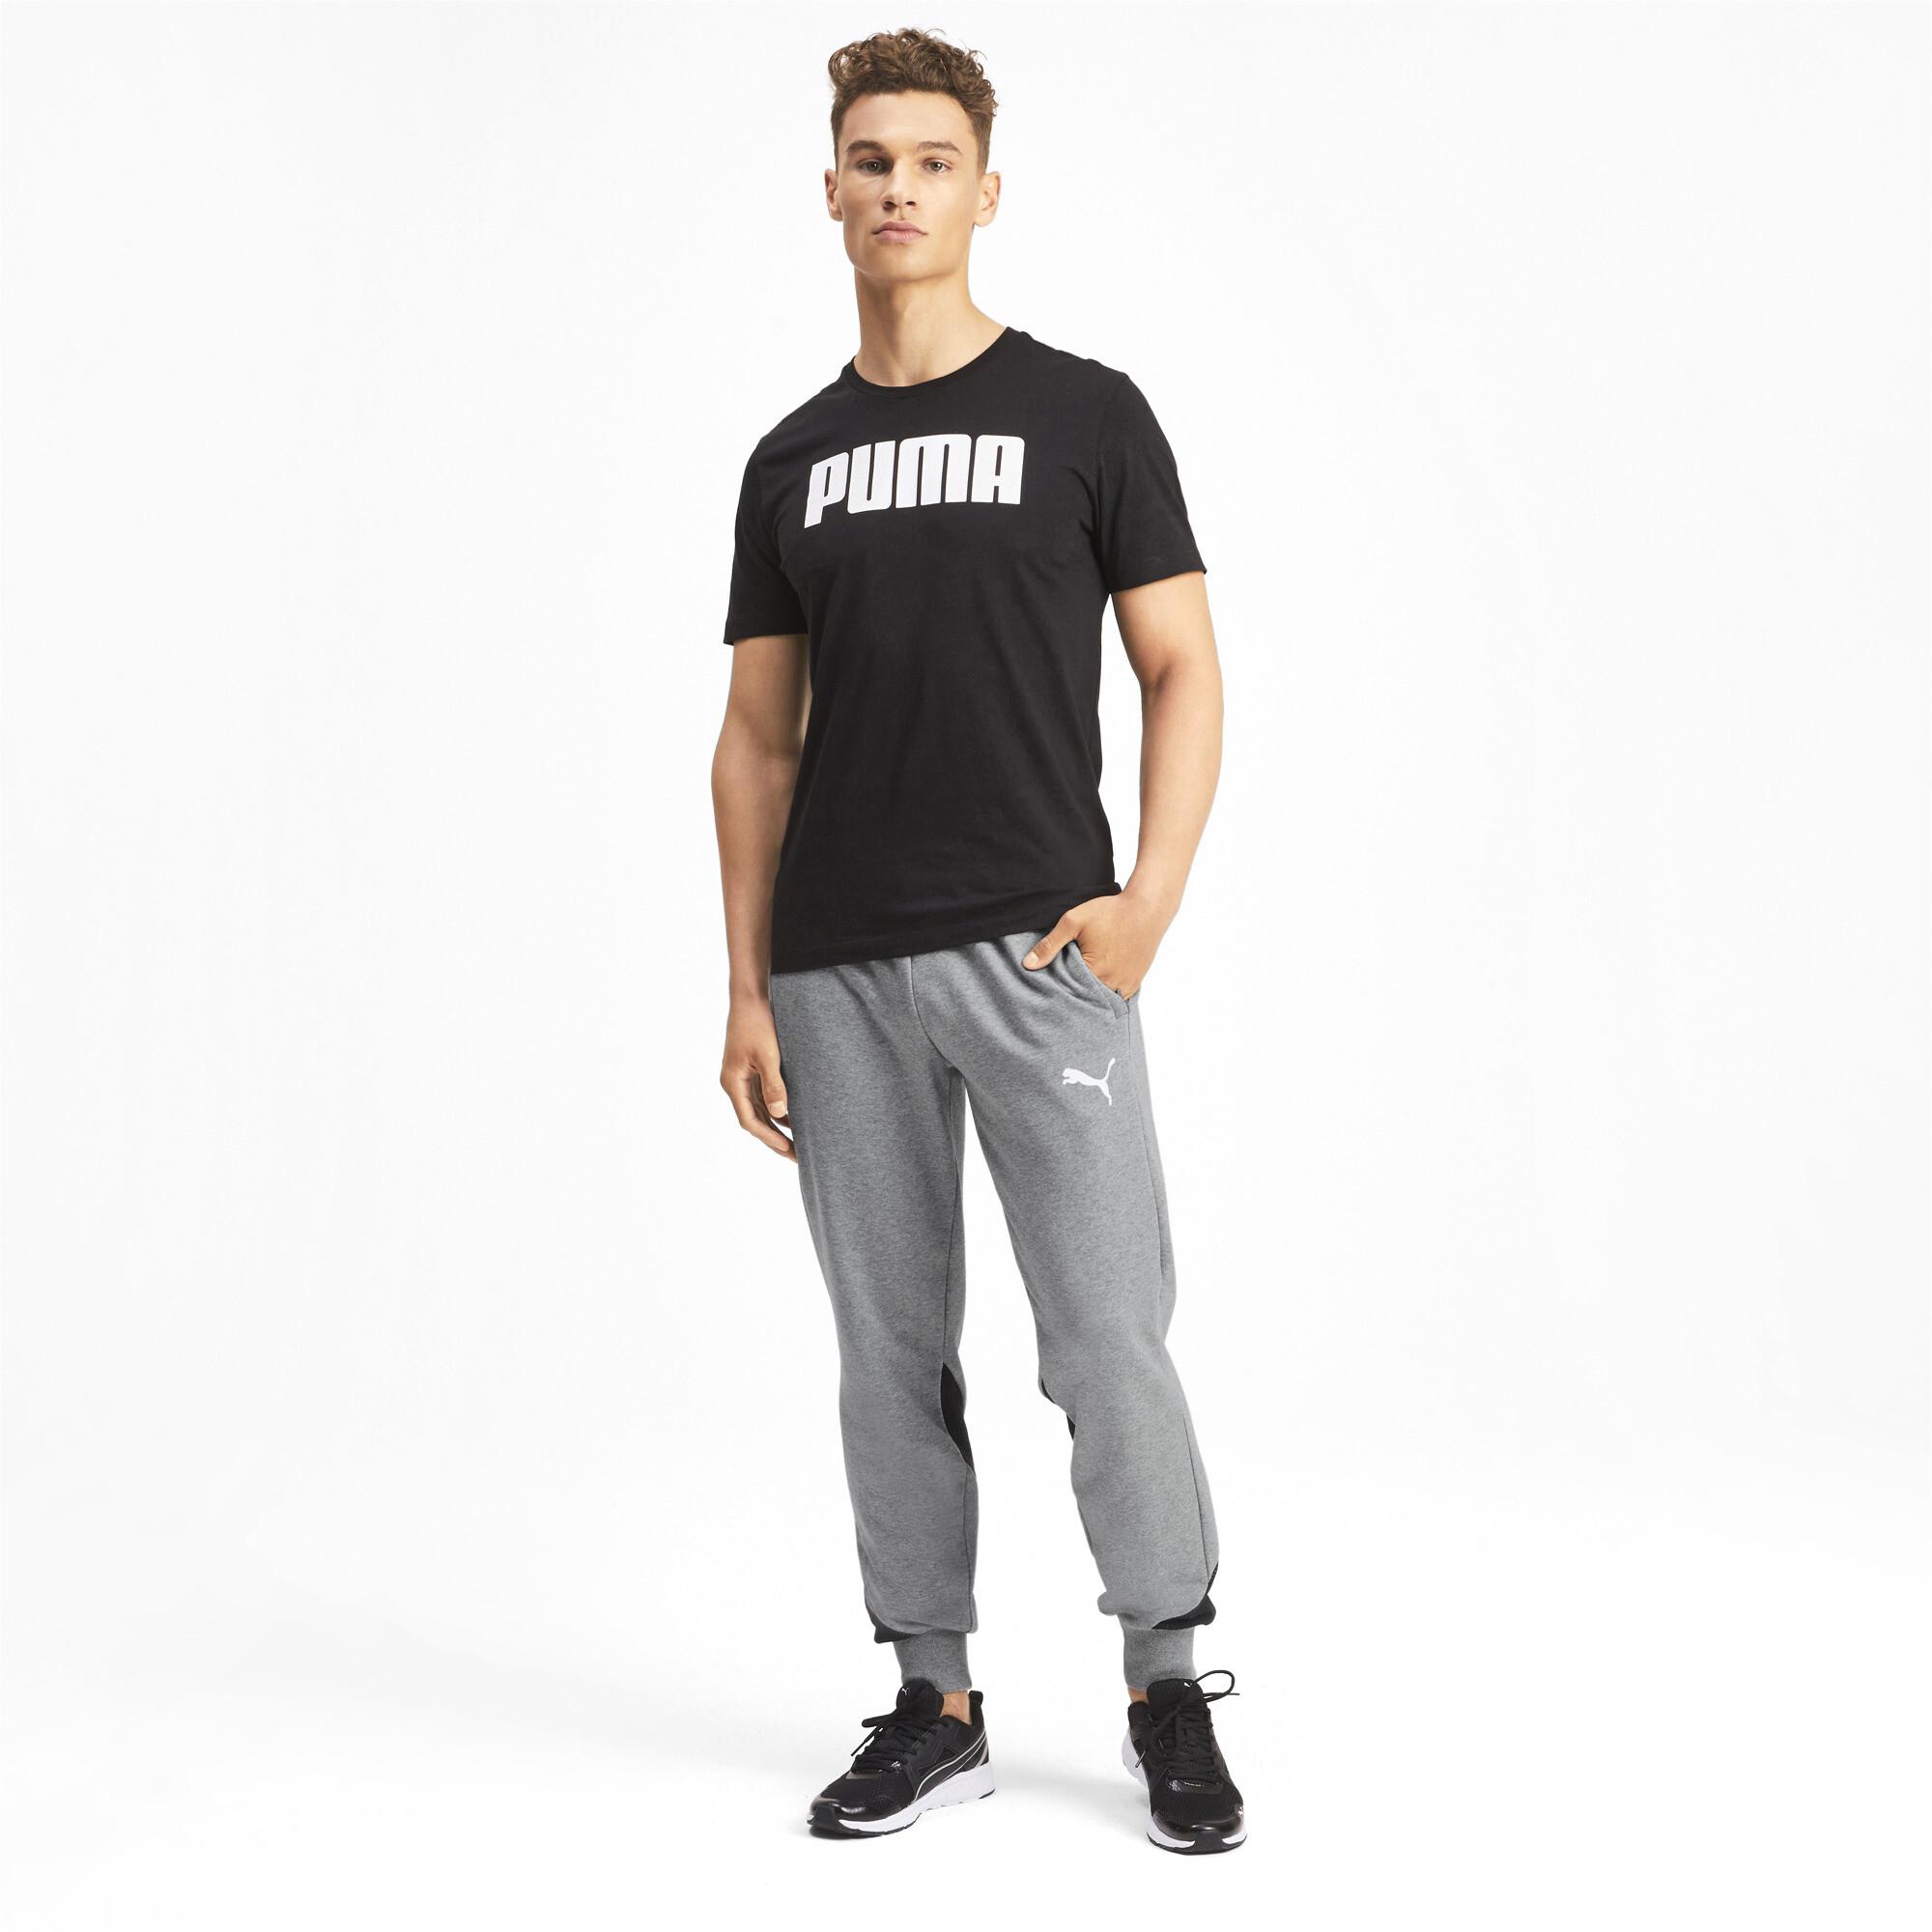 PUMA-Modern-Sports-Men-039-s-Sweatpants-Men-Knitted-Pants-Basics thumbnail 6